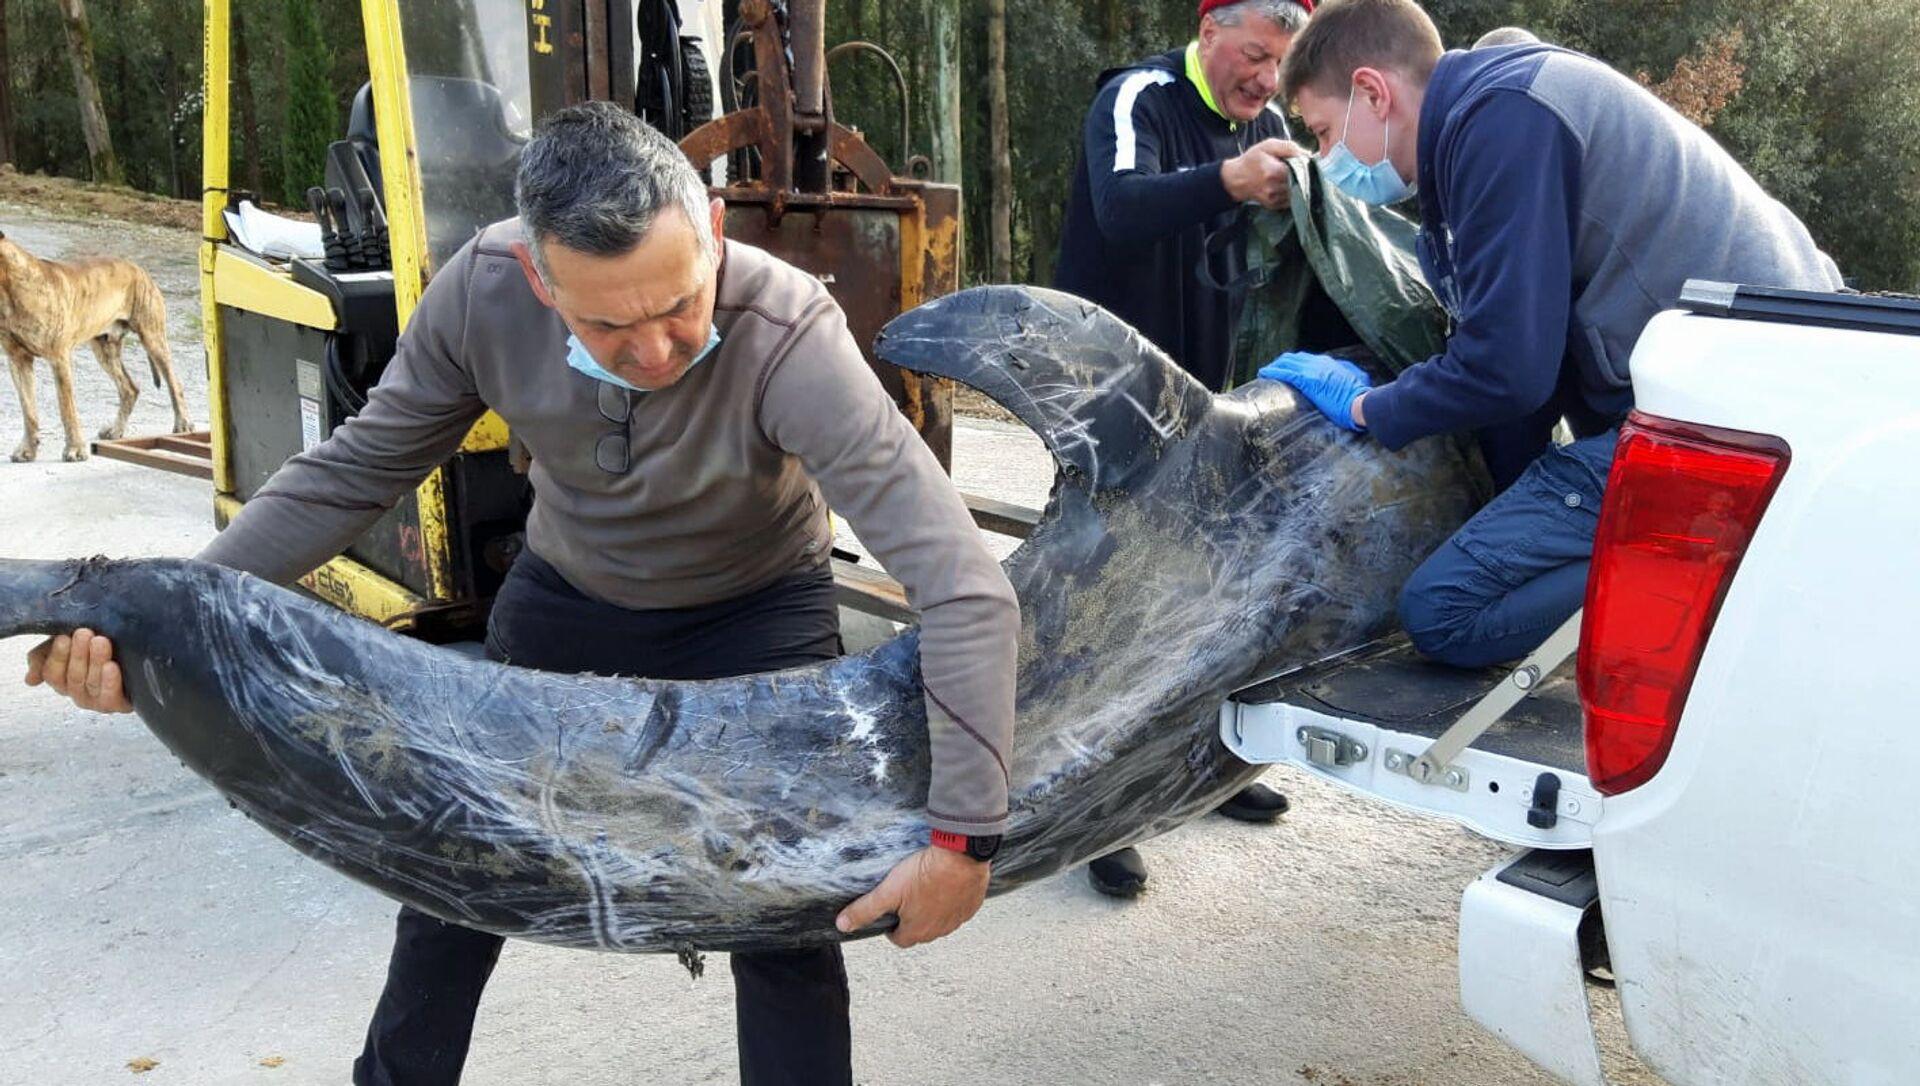 Recupero del delfino spiaggiato, specie grampo (Grampus griseus) - Sputnik Italia, 1920, 10.03.2021